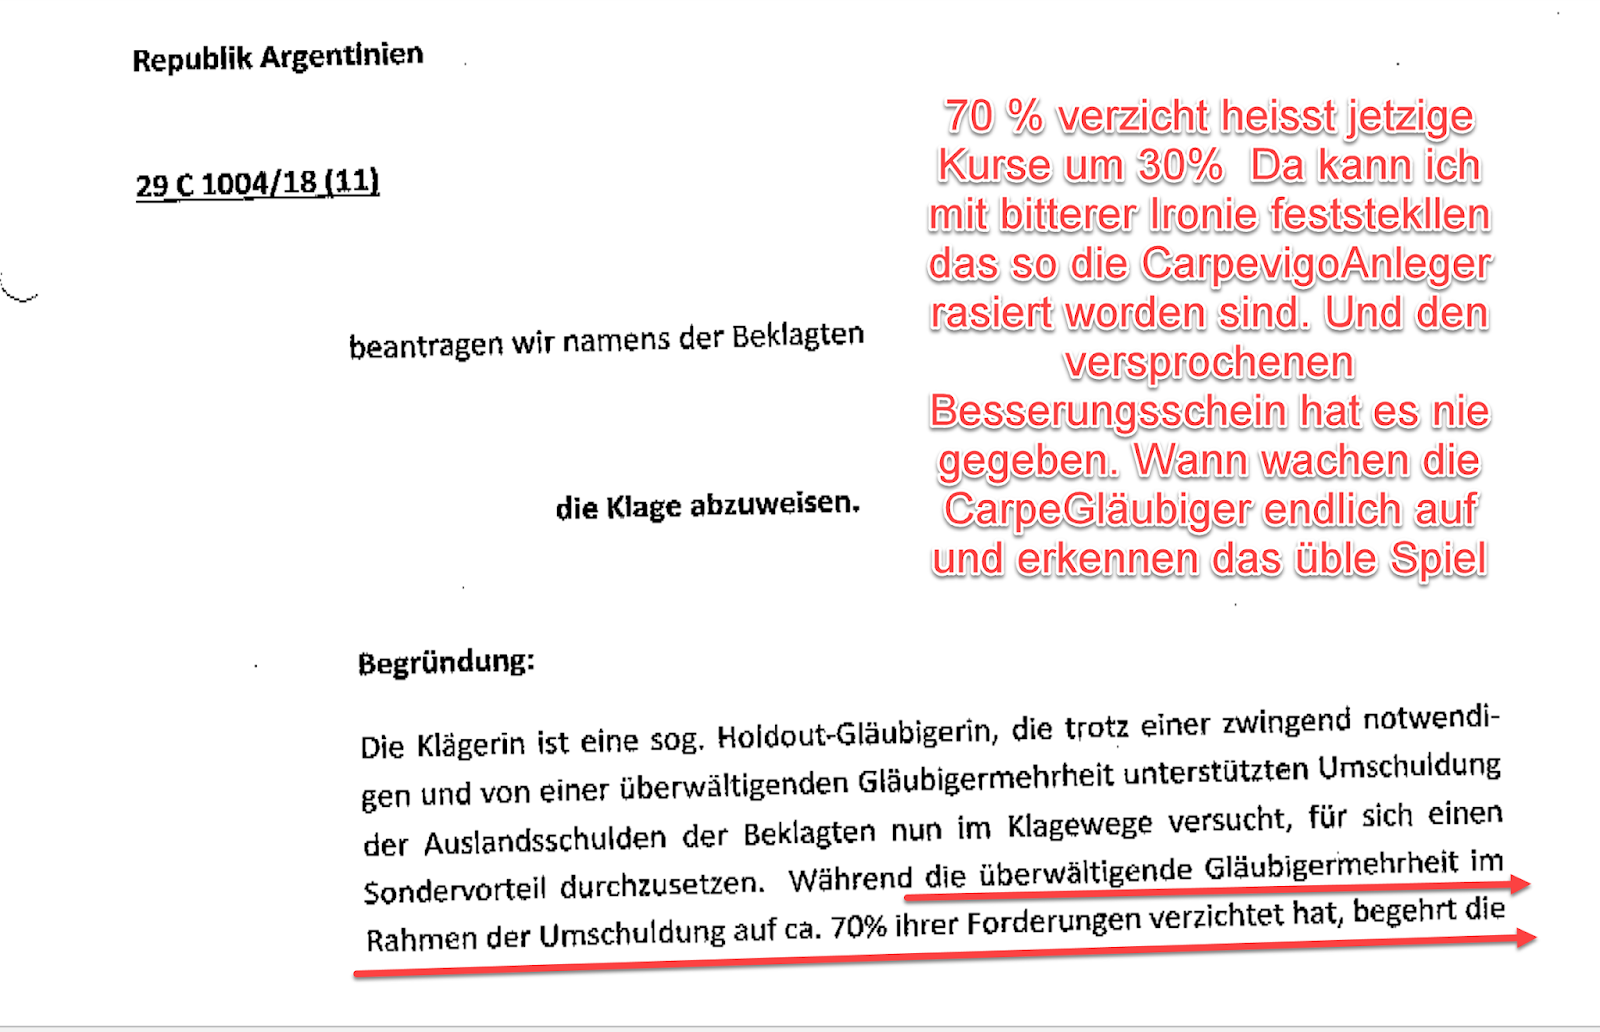 rolf´s Carpevigo Blog: 70 % verzicht heisst jetzige Kurse um 30% Da ...